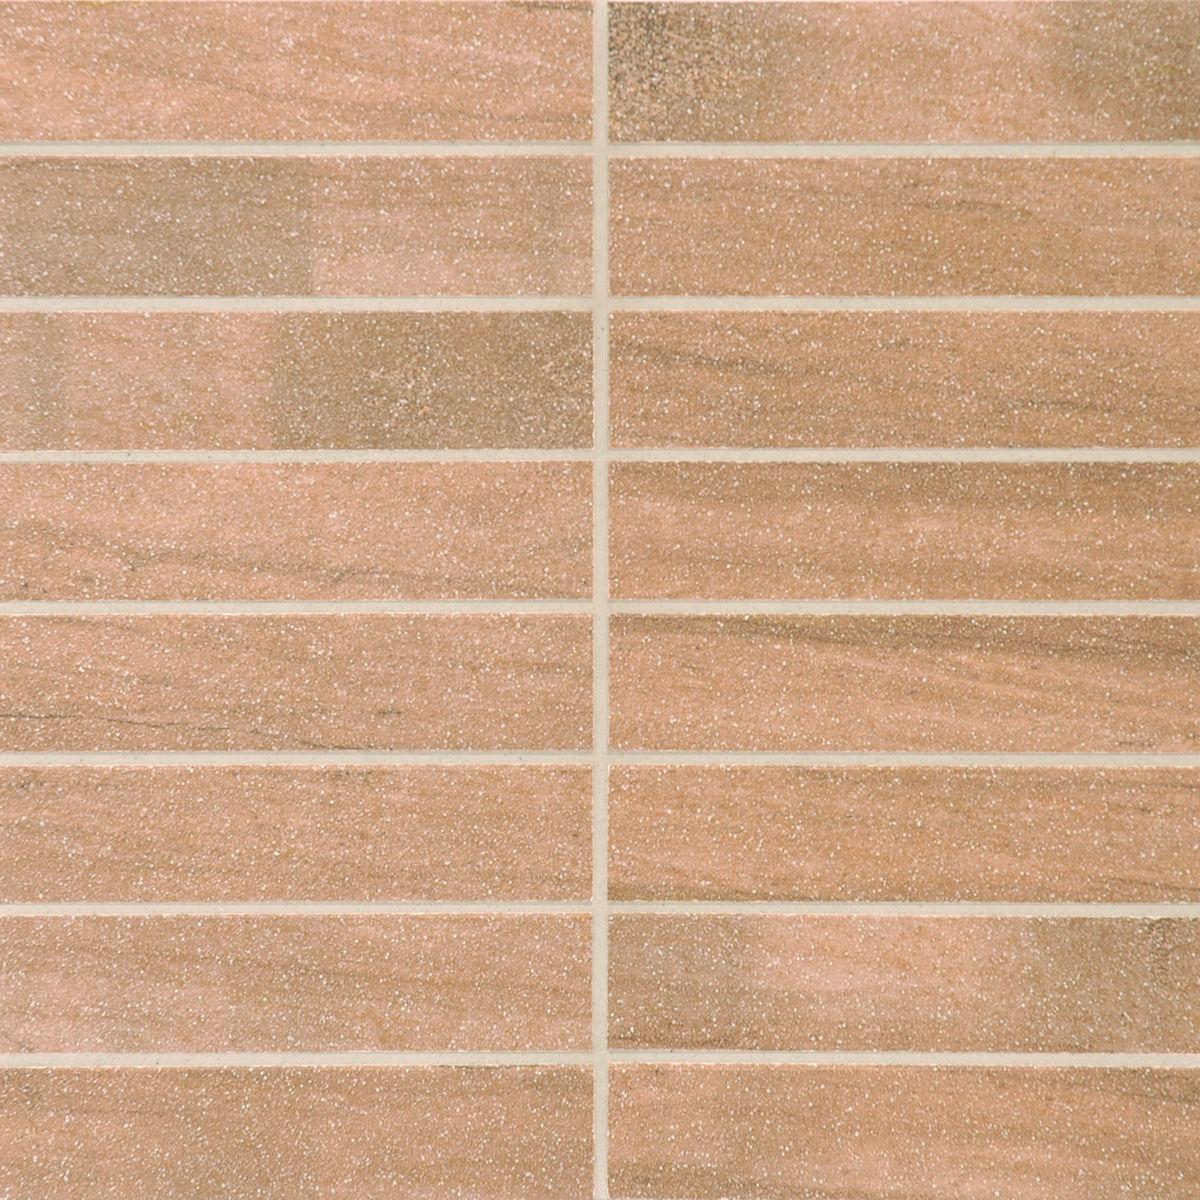 Мозаика Pietra del Deserto bruno (mrcxe3) изображение 0